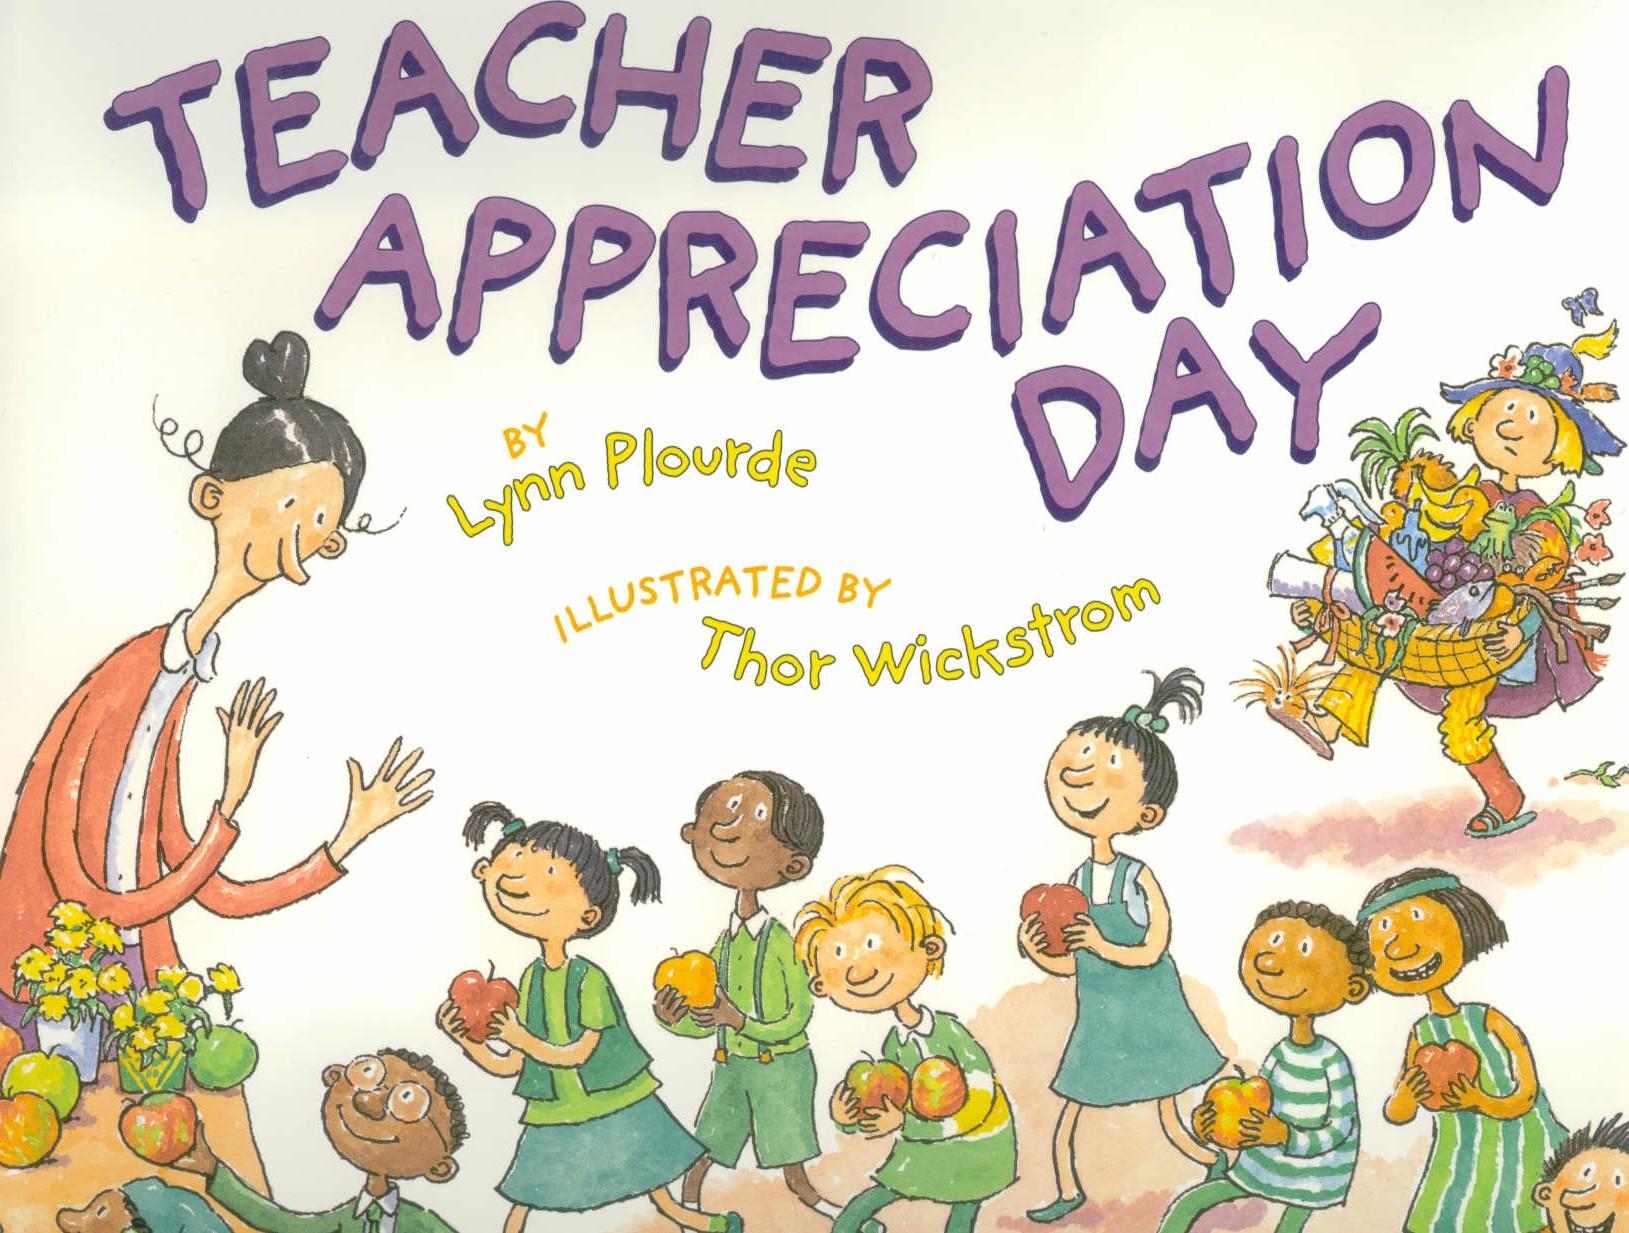 Teacher Appreciation Day 1629x1233